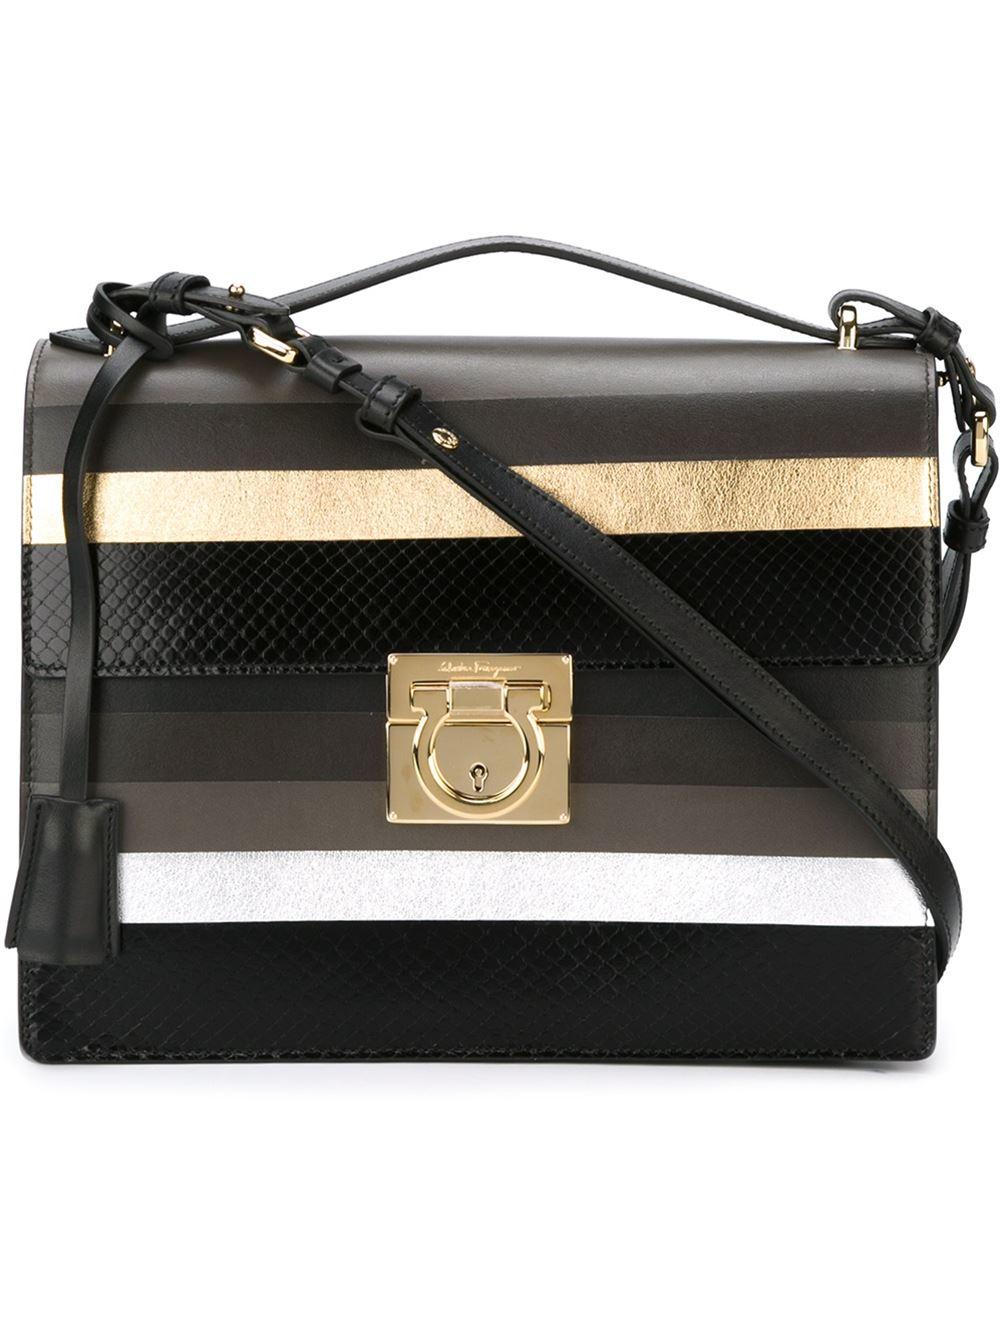 36047eb77eeb Lyst - Ferragamo Aileen Leather Shoulder Bag in Metallic